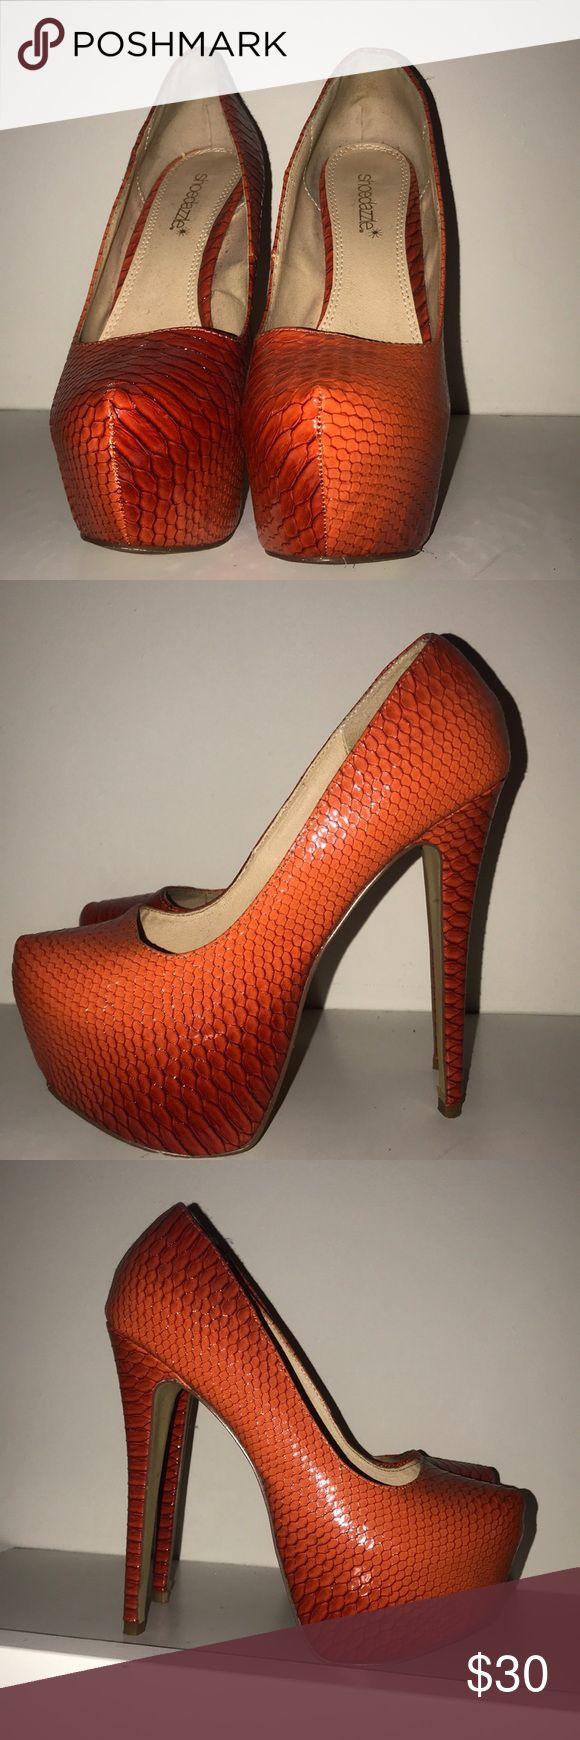 Orange high heels Great condition orange heels Shoes Platforms